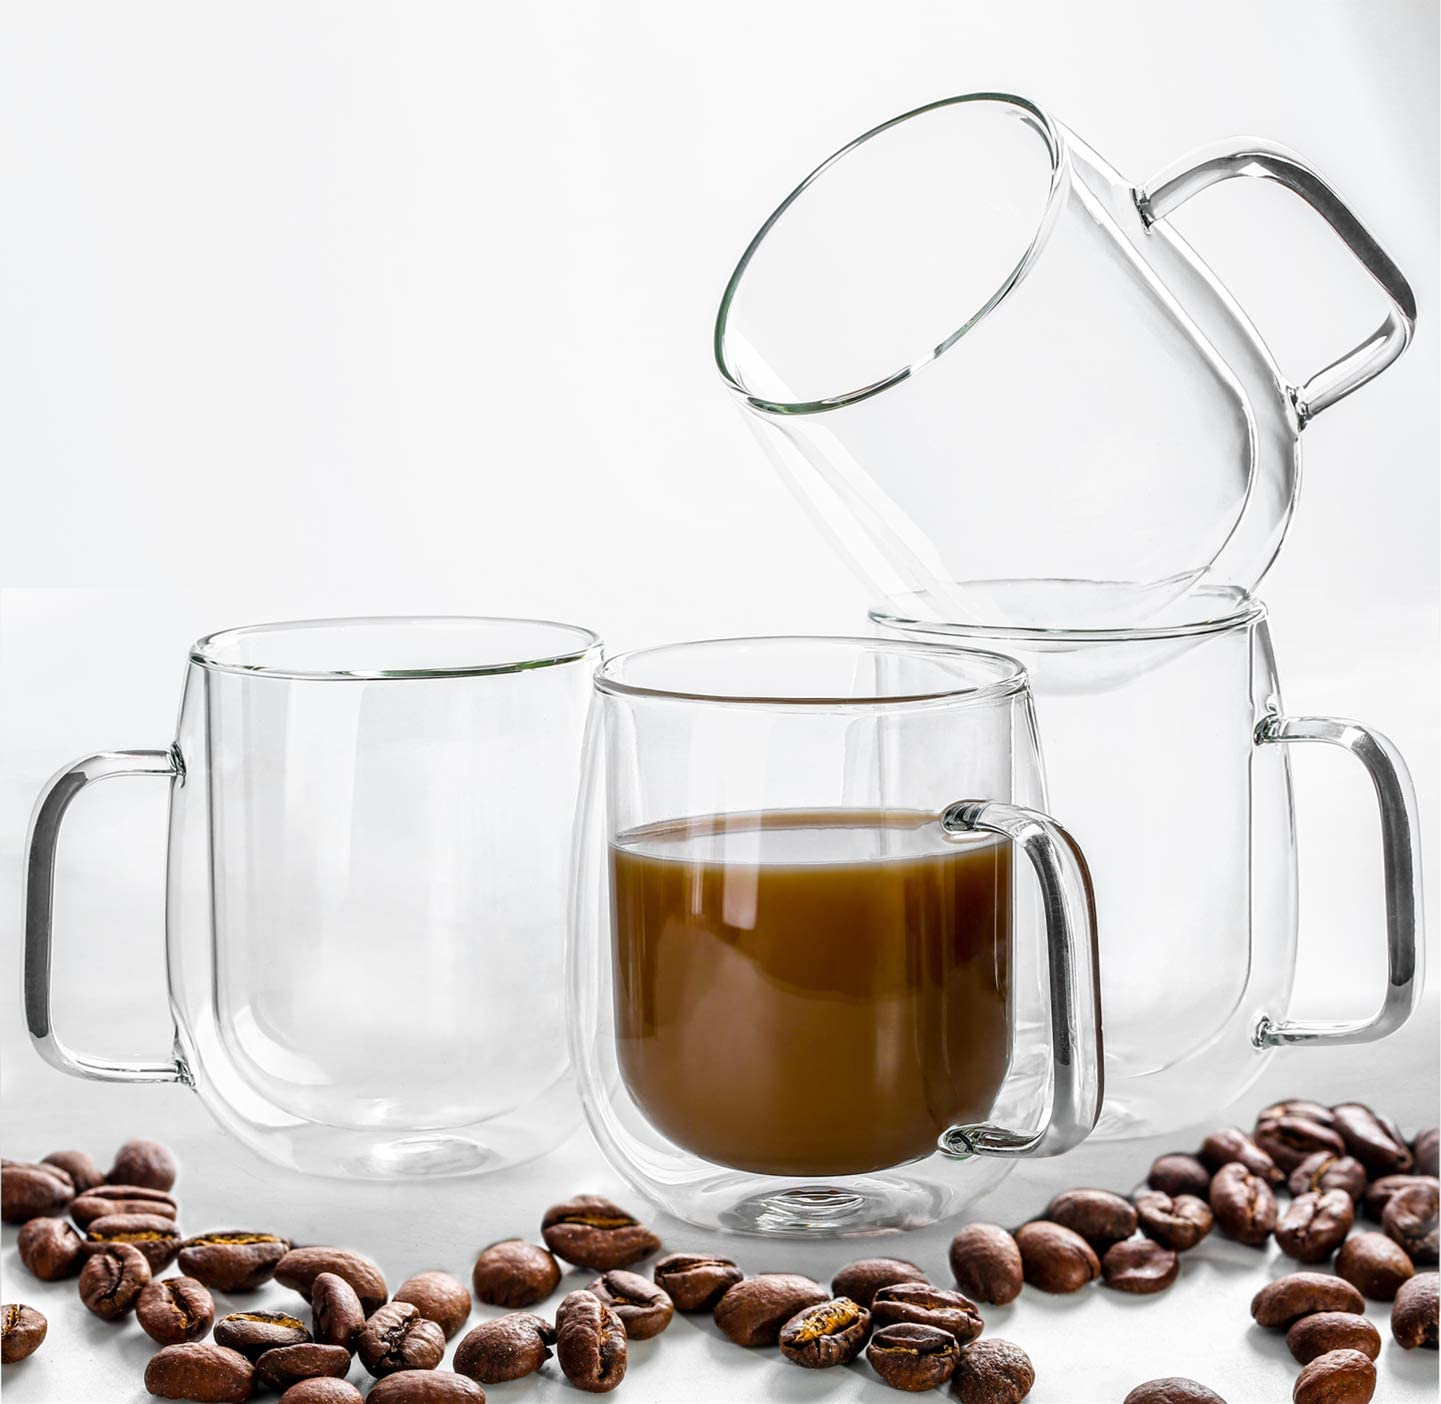 Hovico Insulated Coffee Mugs, Glass Coffee Mugs Set of 4, Clear Coffee Mug 12 Oz, Double Wall Glass Coffee Cups for Latte, Cappuccino, Americano, Tea and Beverage